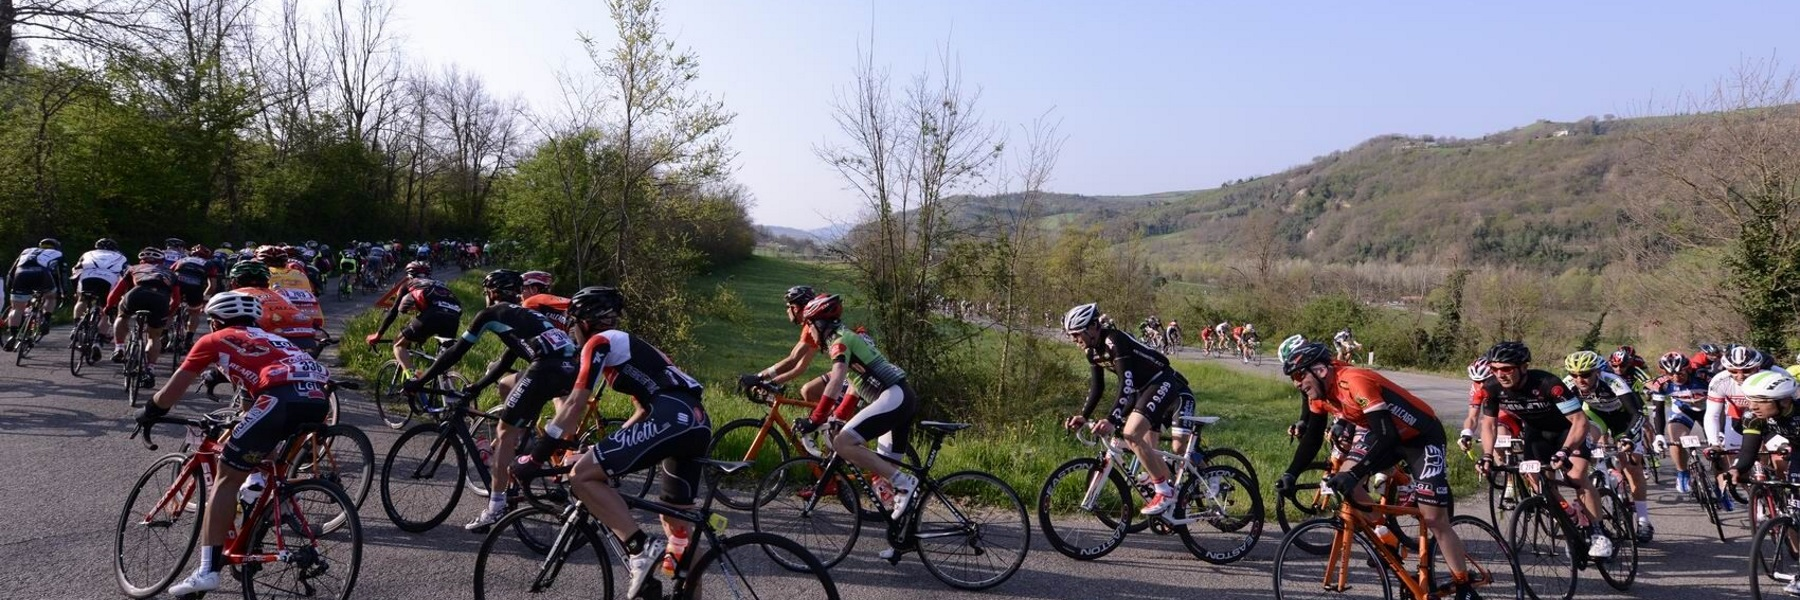 Granfondo The Salt way - Sportur Bicycle Expo